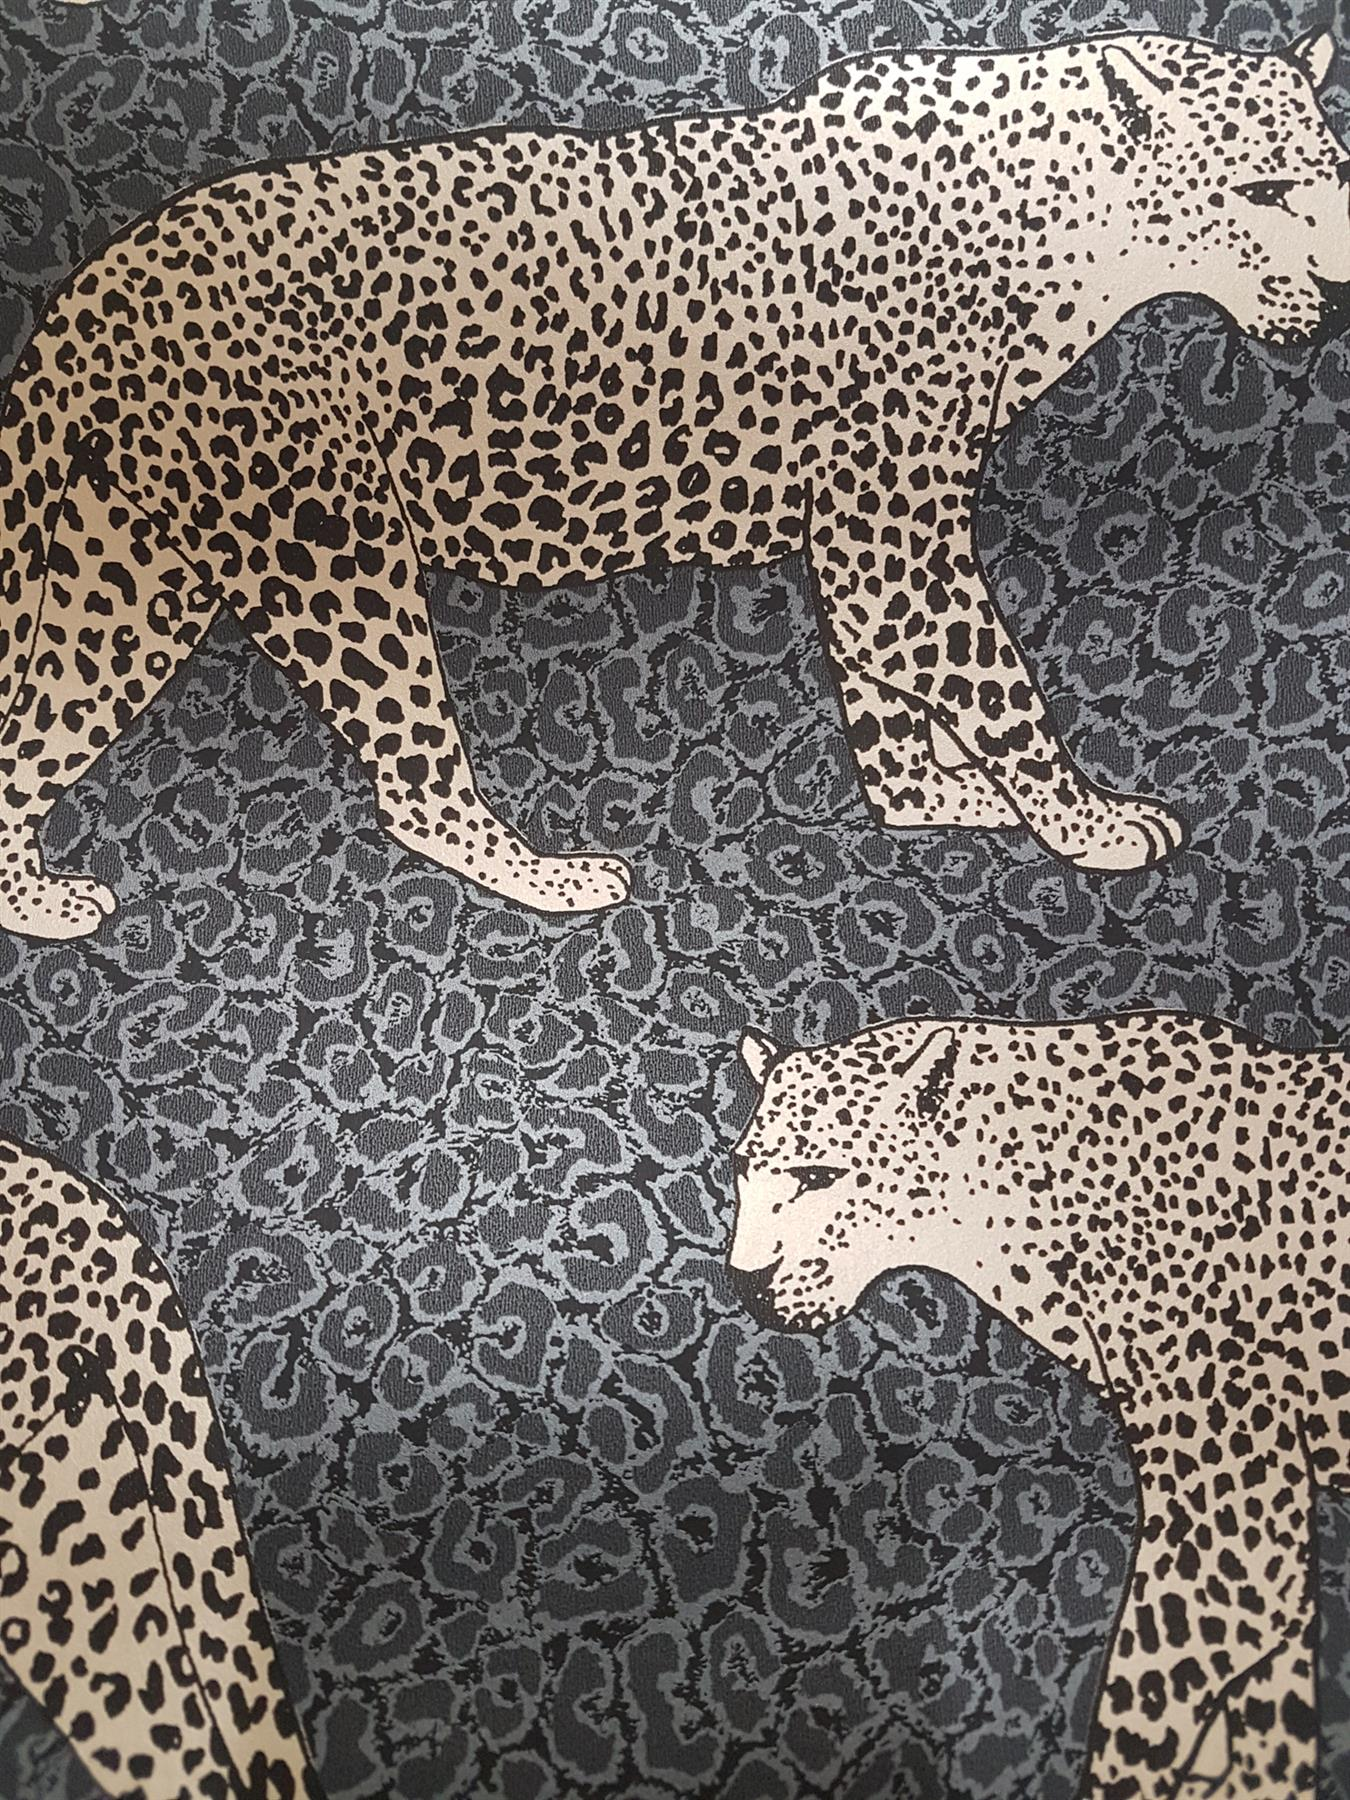 Silver Grey Gold Black Leopard Wallpaper Metallic Shimmer Animal Print Rasch